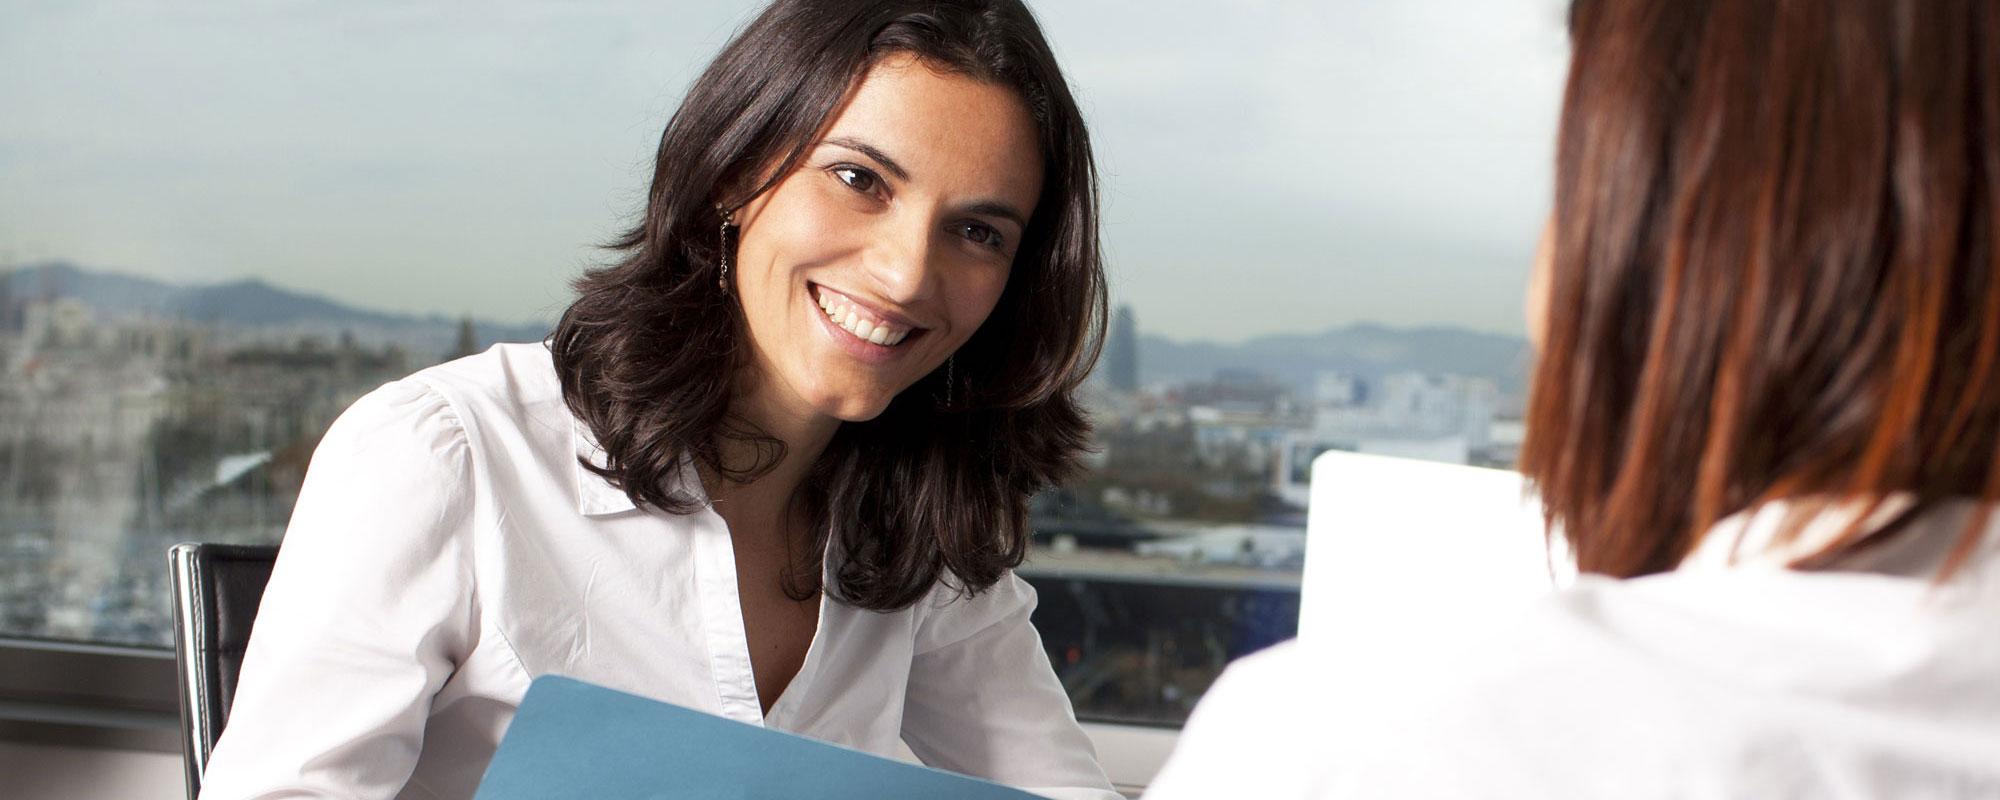 ZFA – Zahnmedizinische(r) Fachangestellte(r) – Assistenz am Behandlungsstuhl